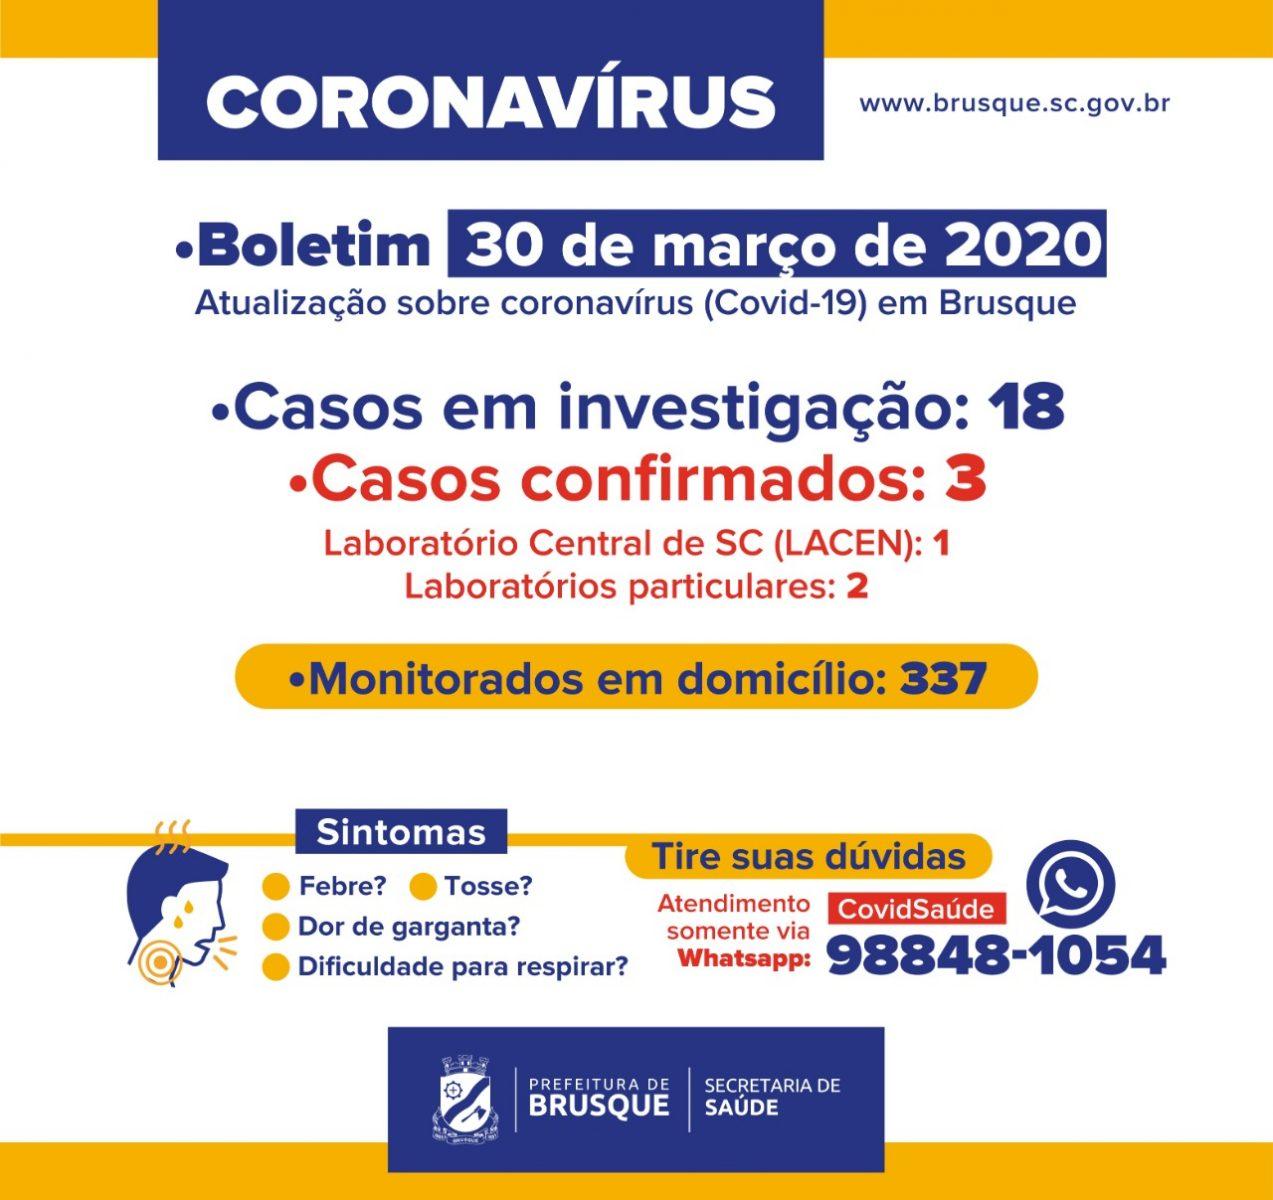 Confira o Boletim Epidemiológico da Prefeitura de Brusque desta segunda-feira (30)